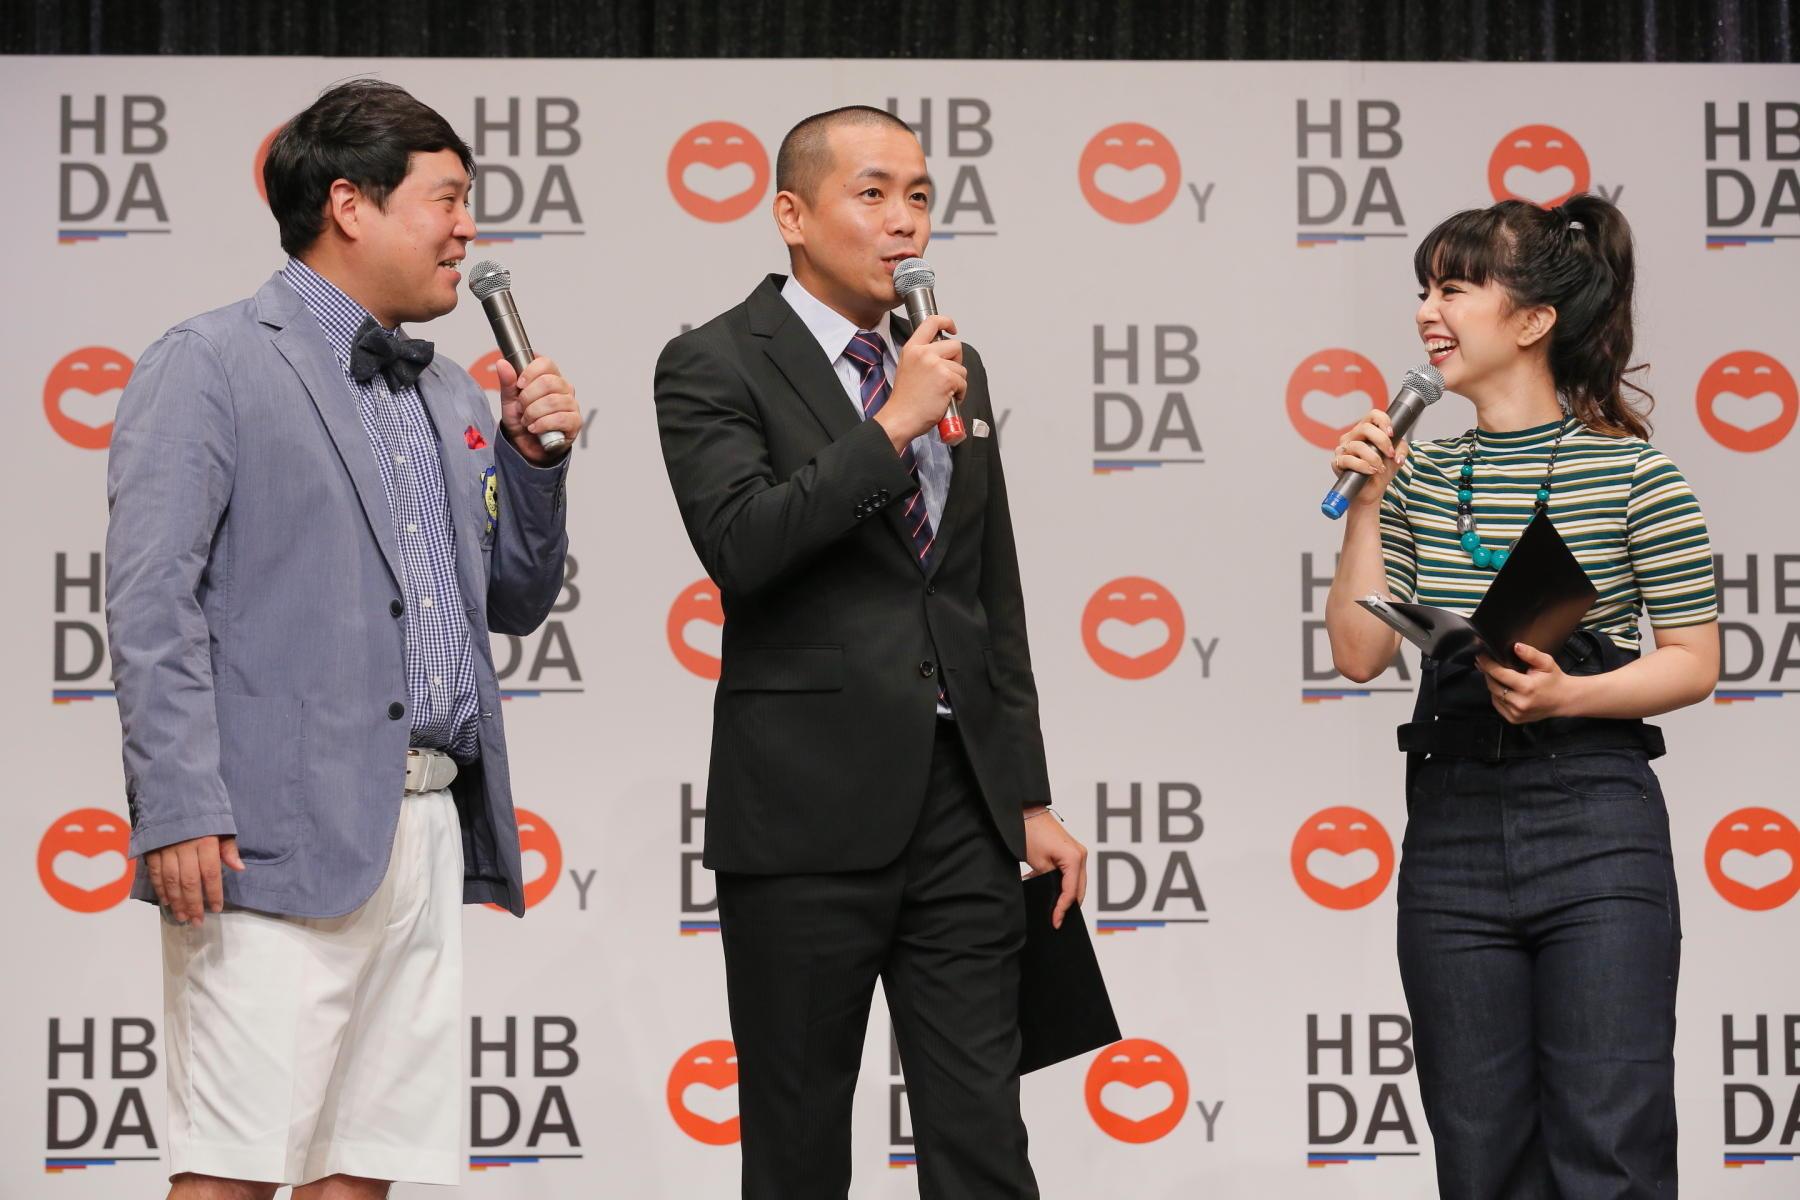 http://news.yoshimoto.co.jp/20161018175300-9efee6093fcd924a2505bf63c96854991eab24e7.jpg